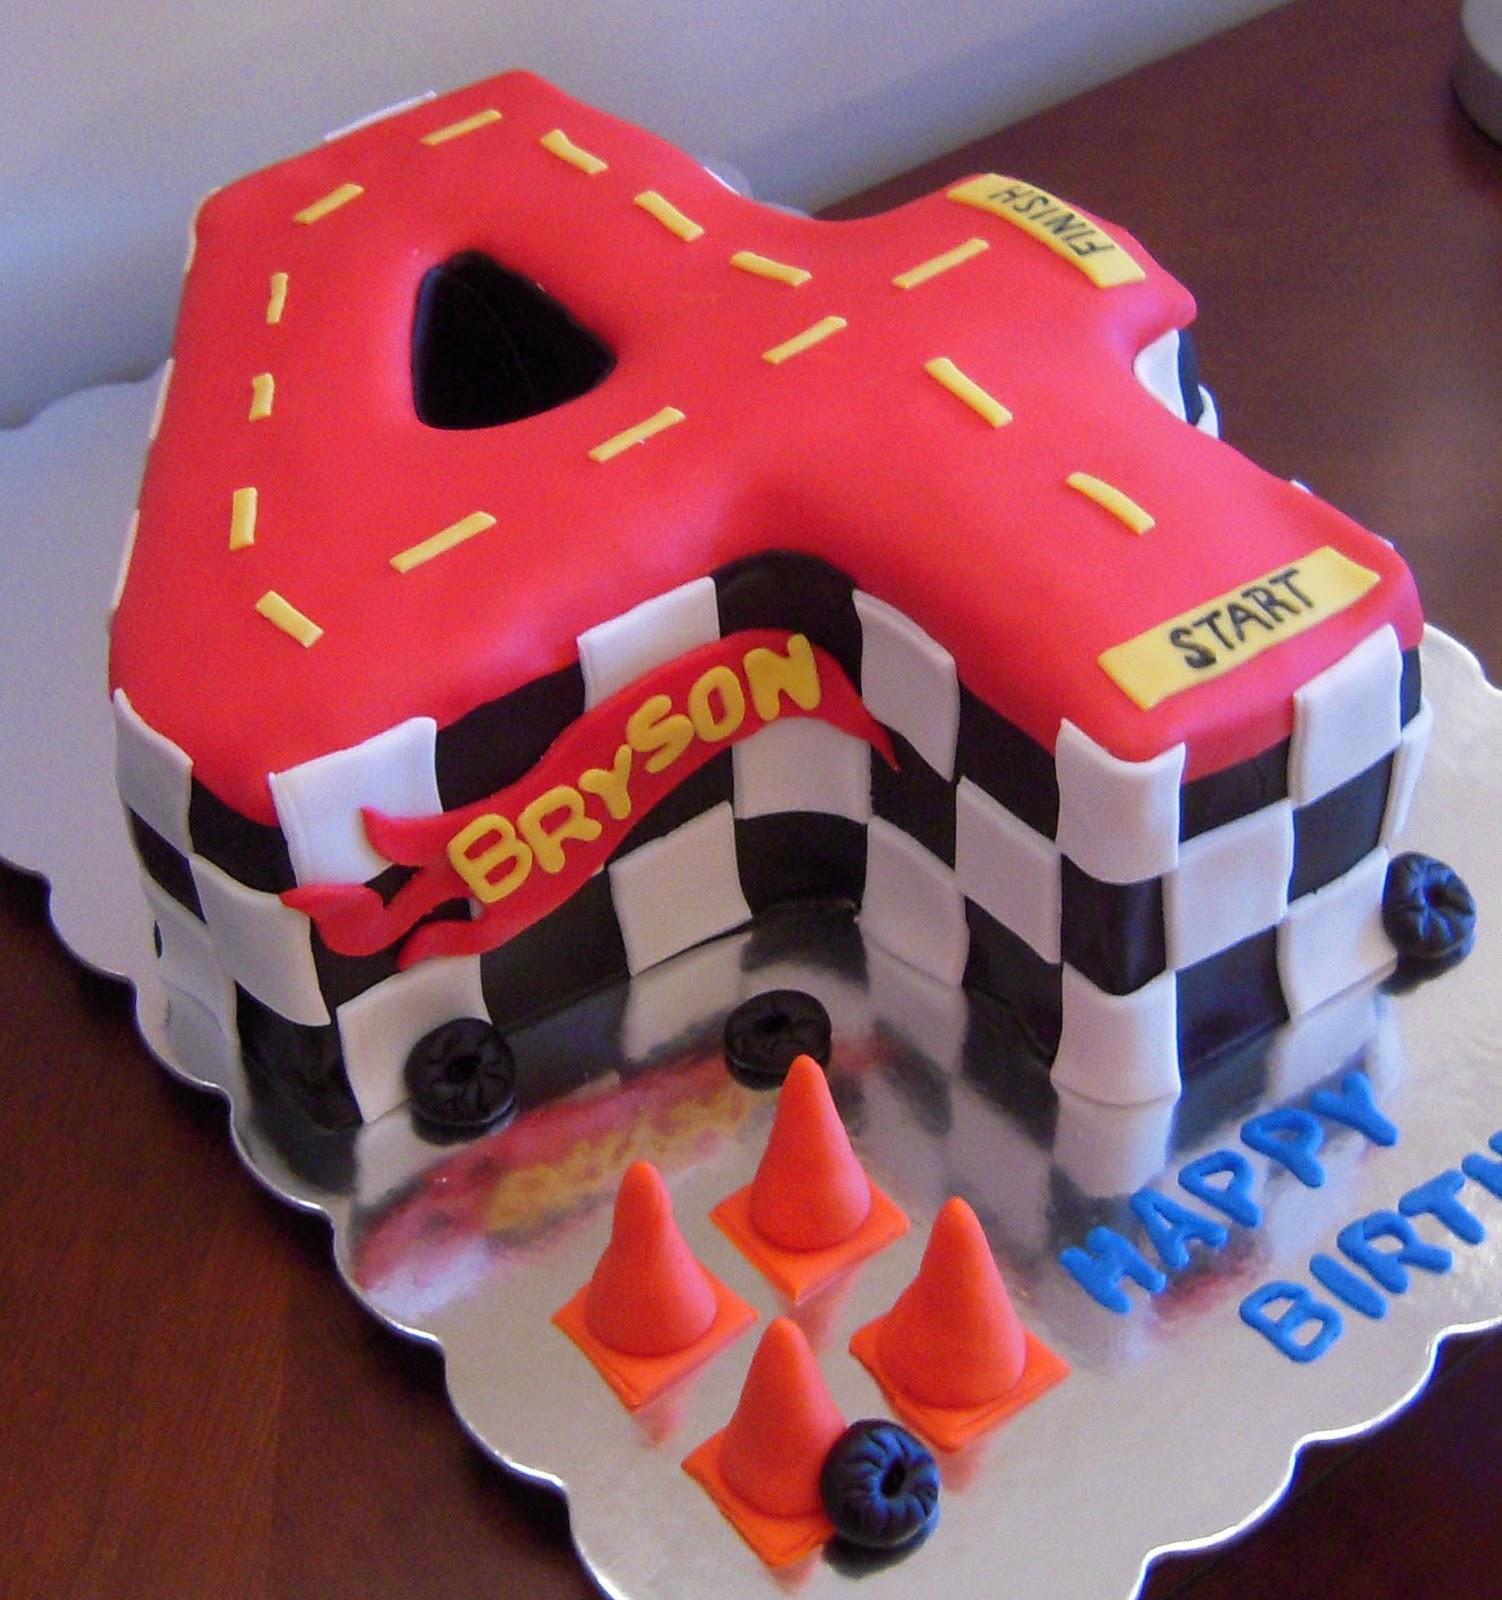 Icing Makes The Cake Hot Wheels Birthday Cake